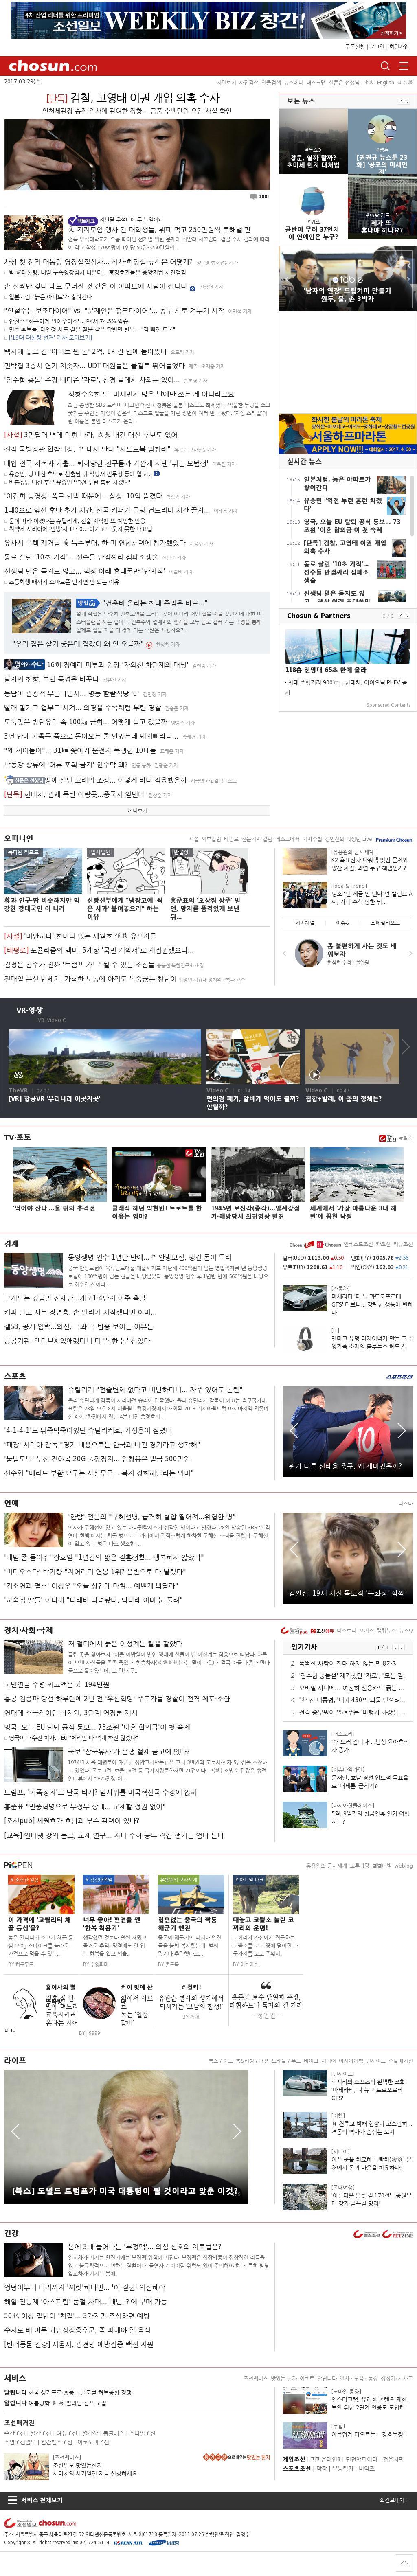 chosun.com at Tuesday March 28, 2017, 11:02 p.m. UTC